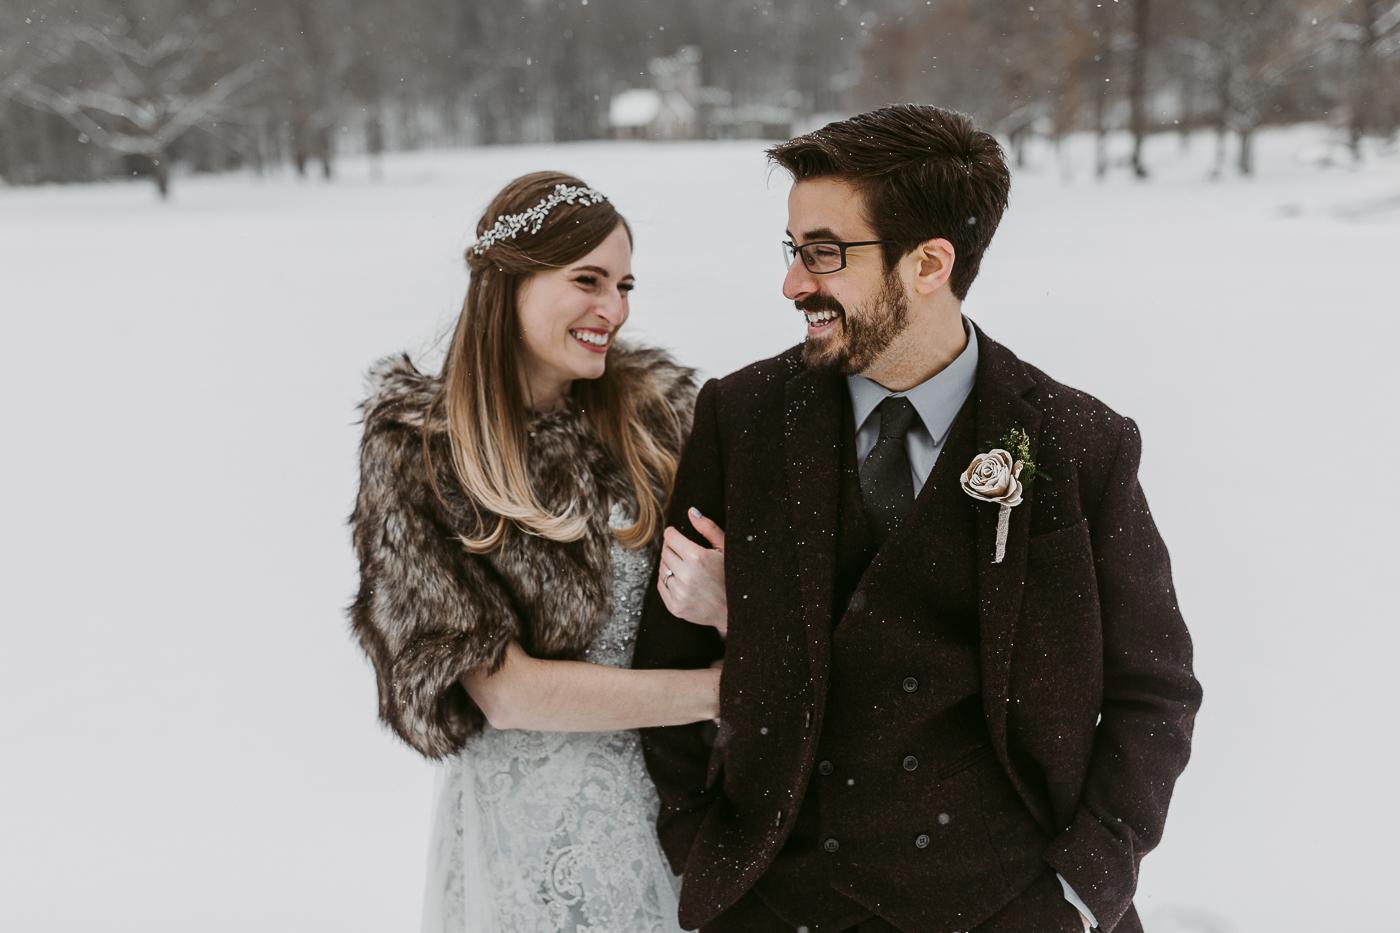 Squires-Castle-Winter-Wedding-8.jpg